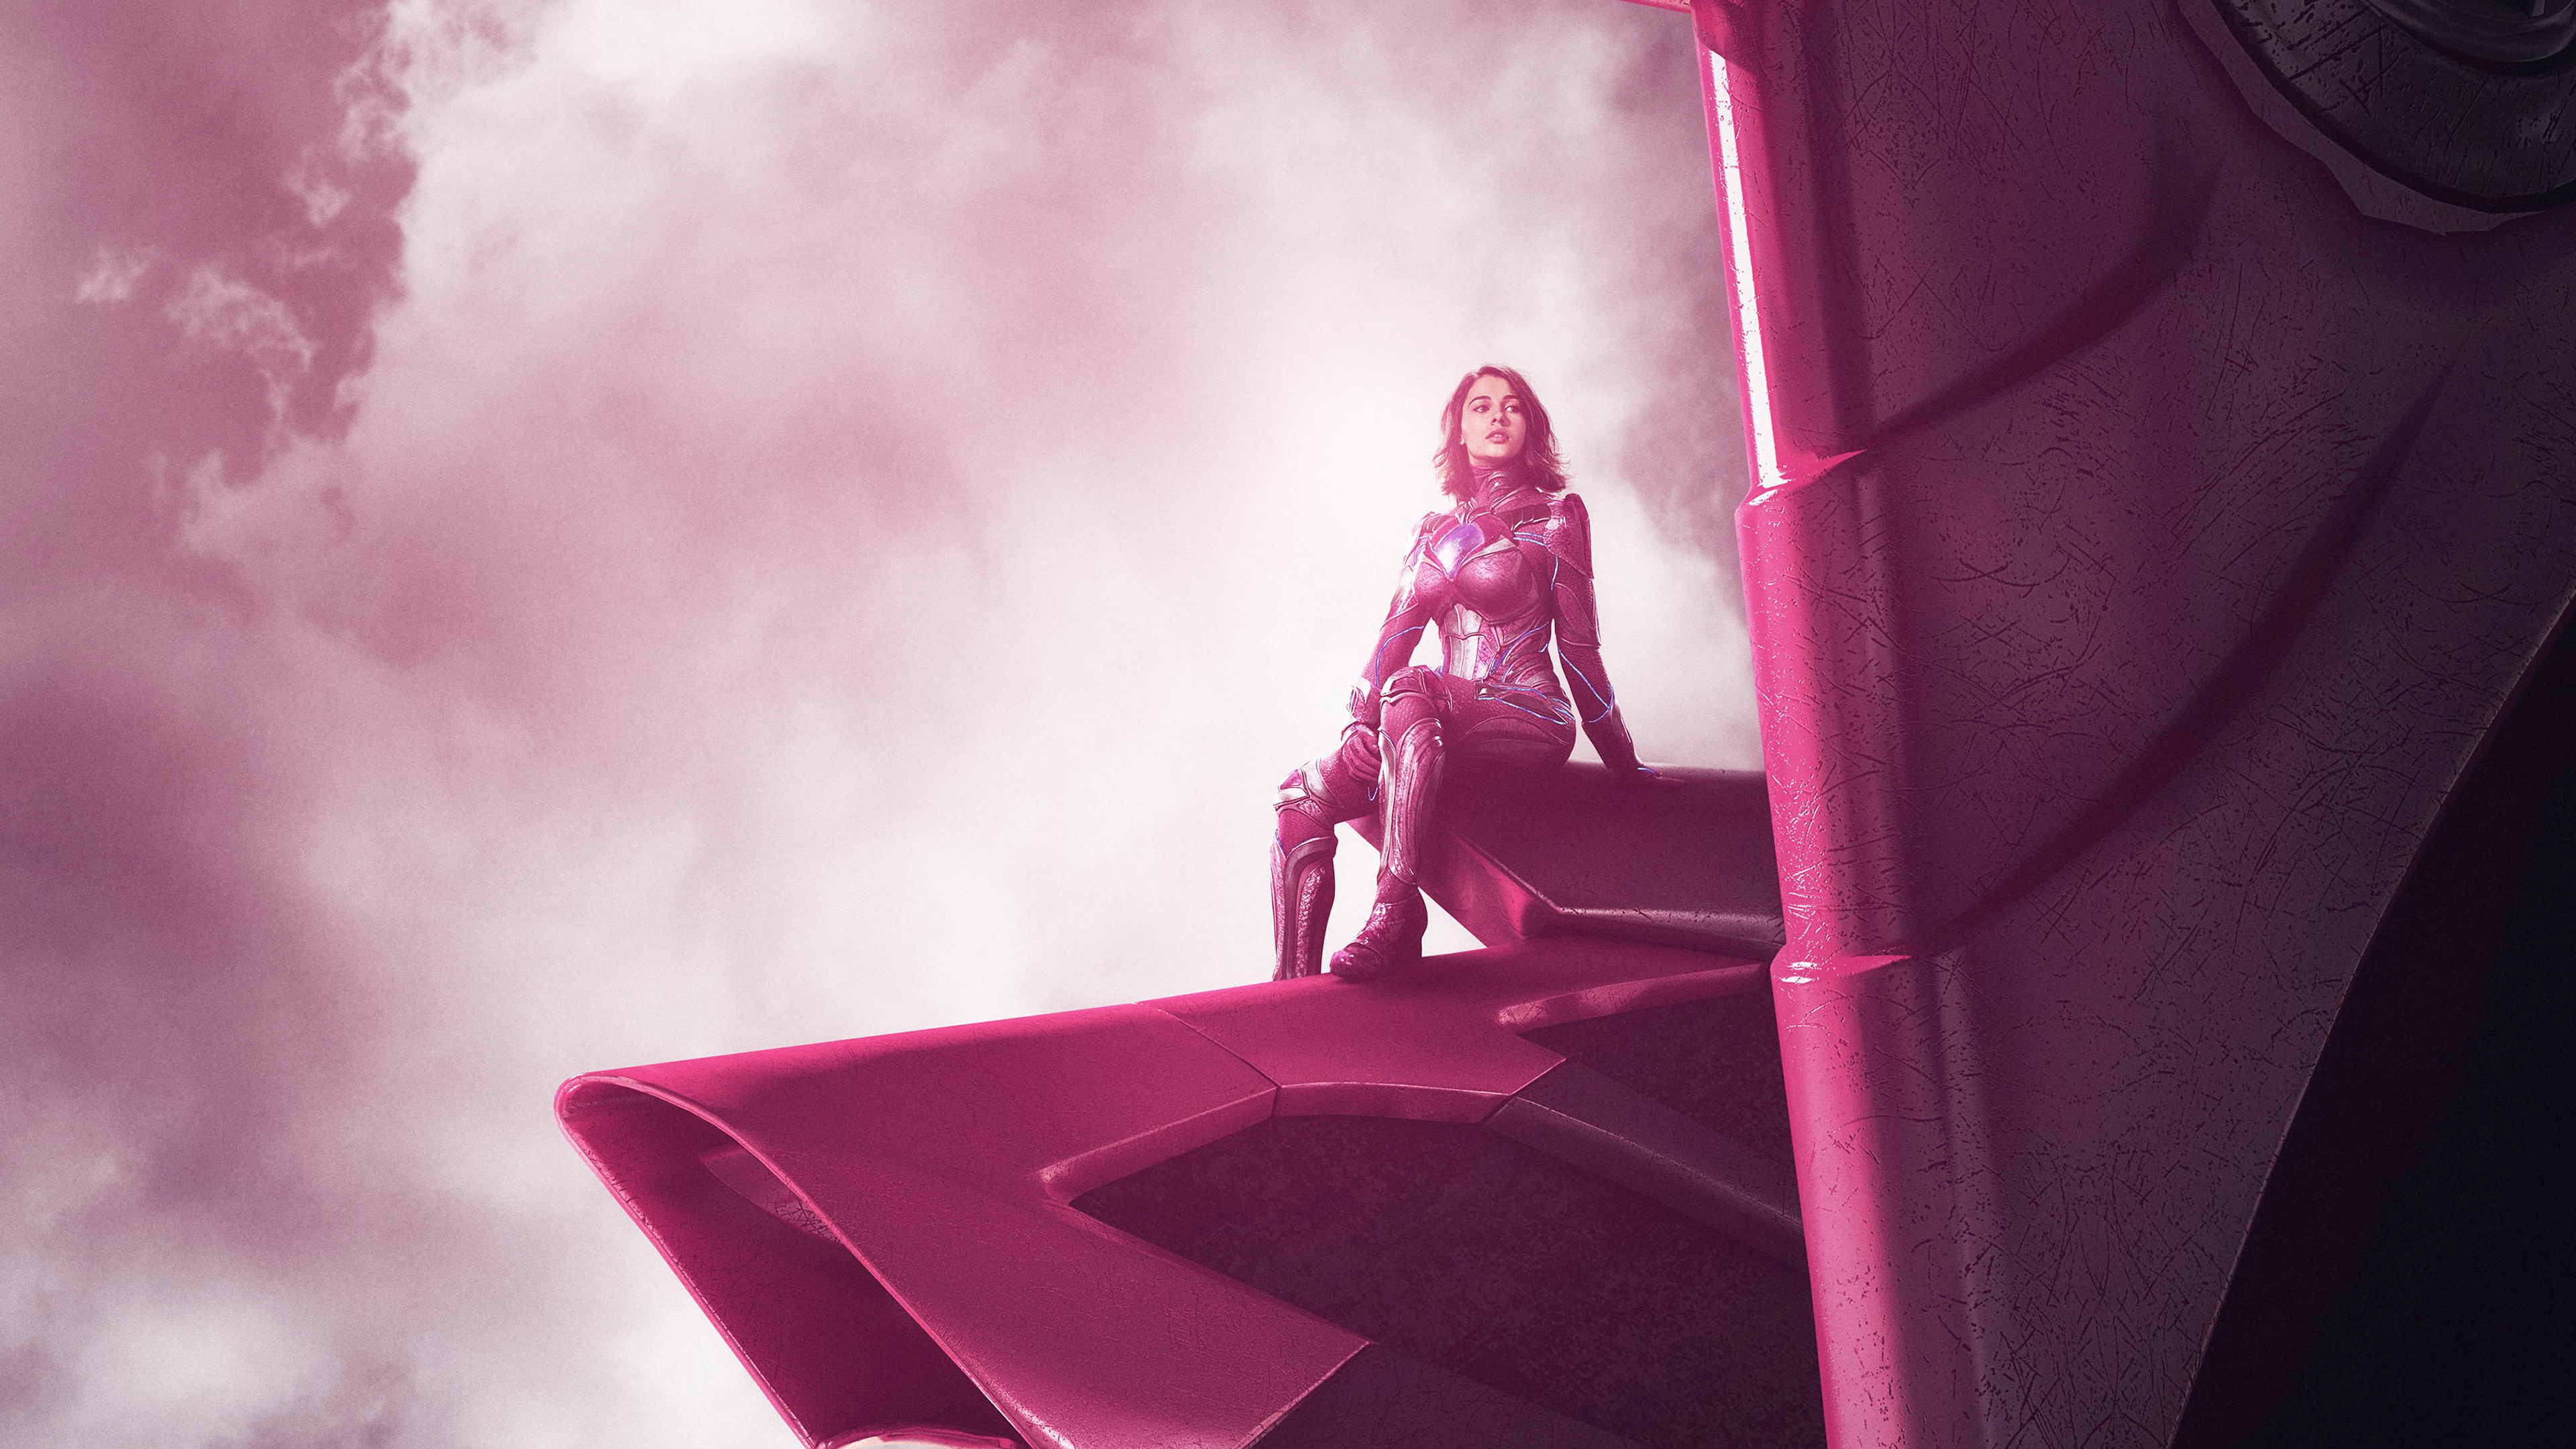 2017 power rangers zord pink hd movies 4k wallpapers - Pink wallpaper 4k ...